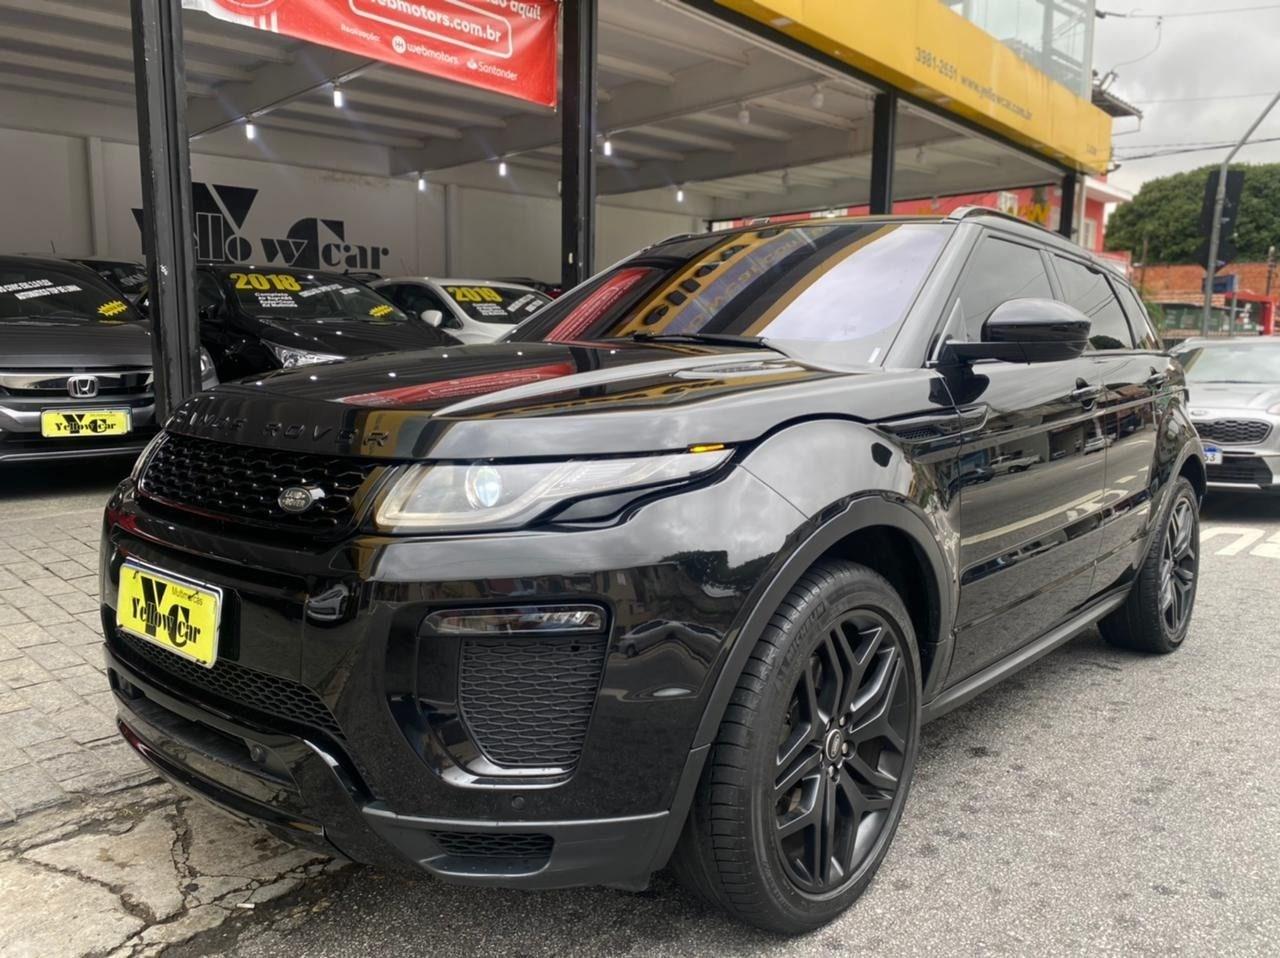 //www.autoline.com.br/carro/land-rover/range-rover-evoque-20-hse-dynamic-16v-gasolina-4p-4x4-turbo-auto/2018/sao-paulo-sp/14657394